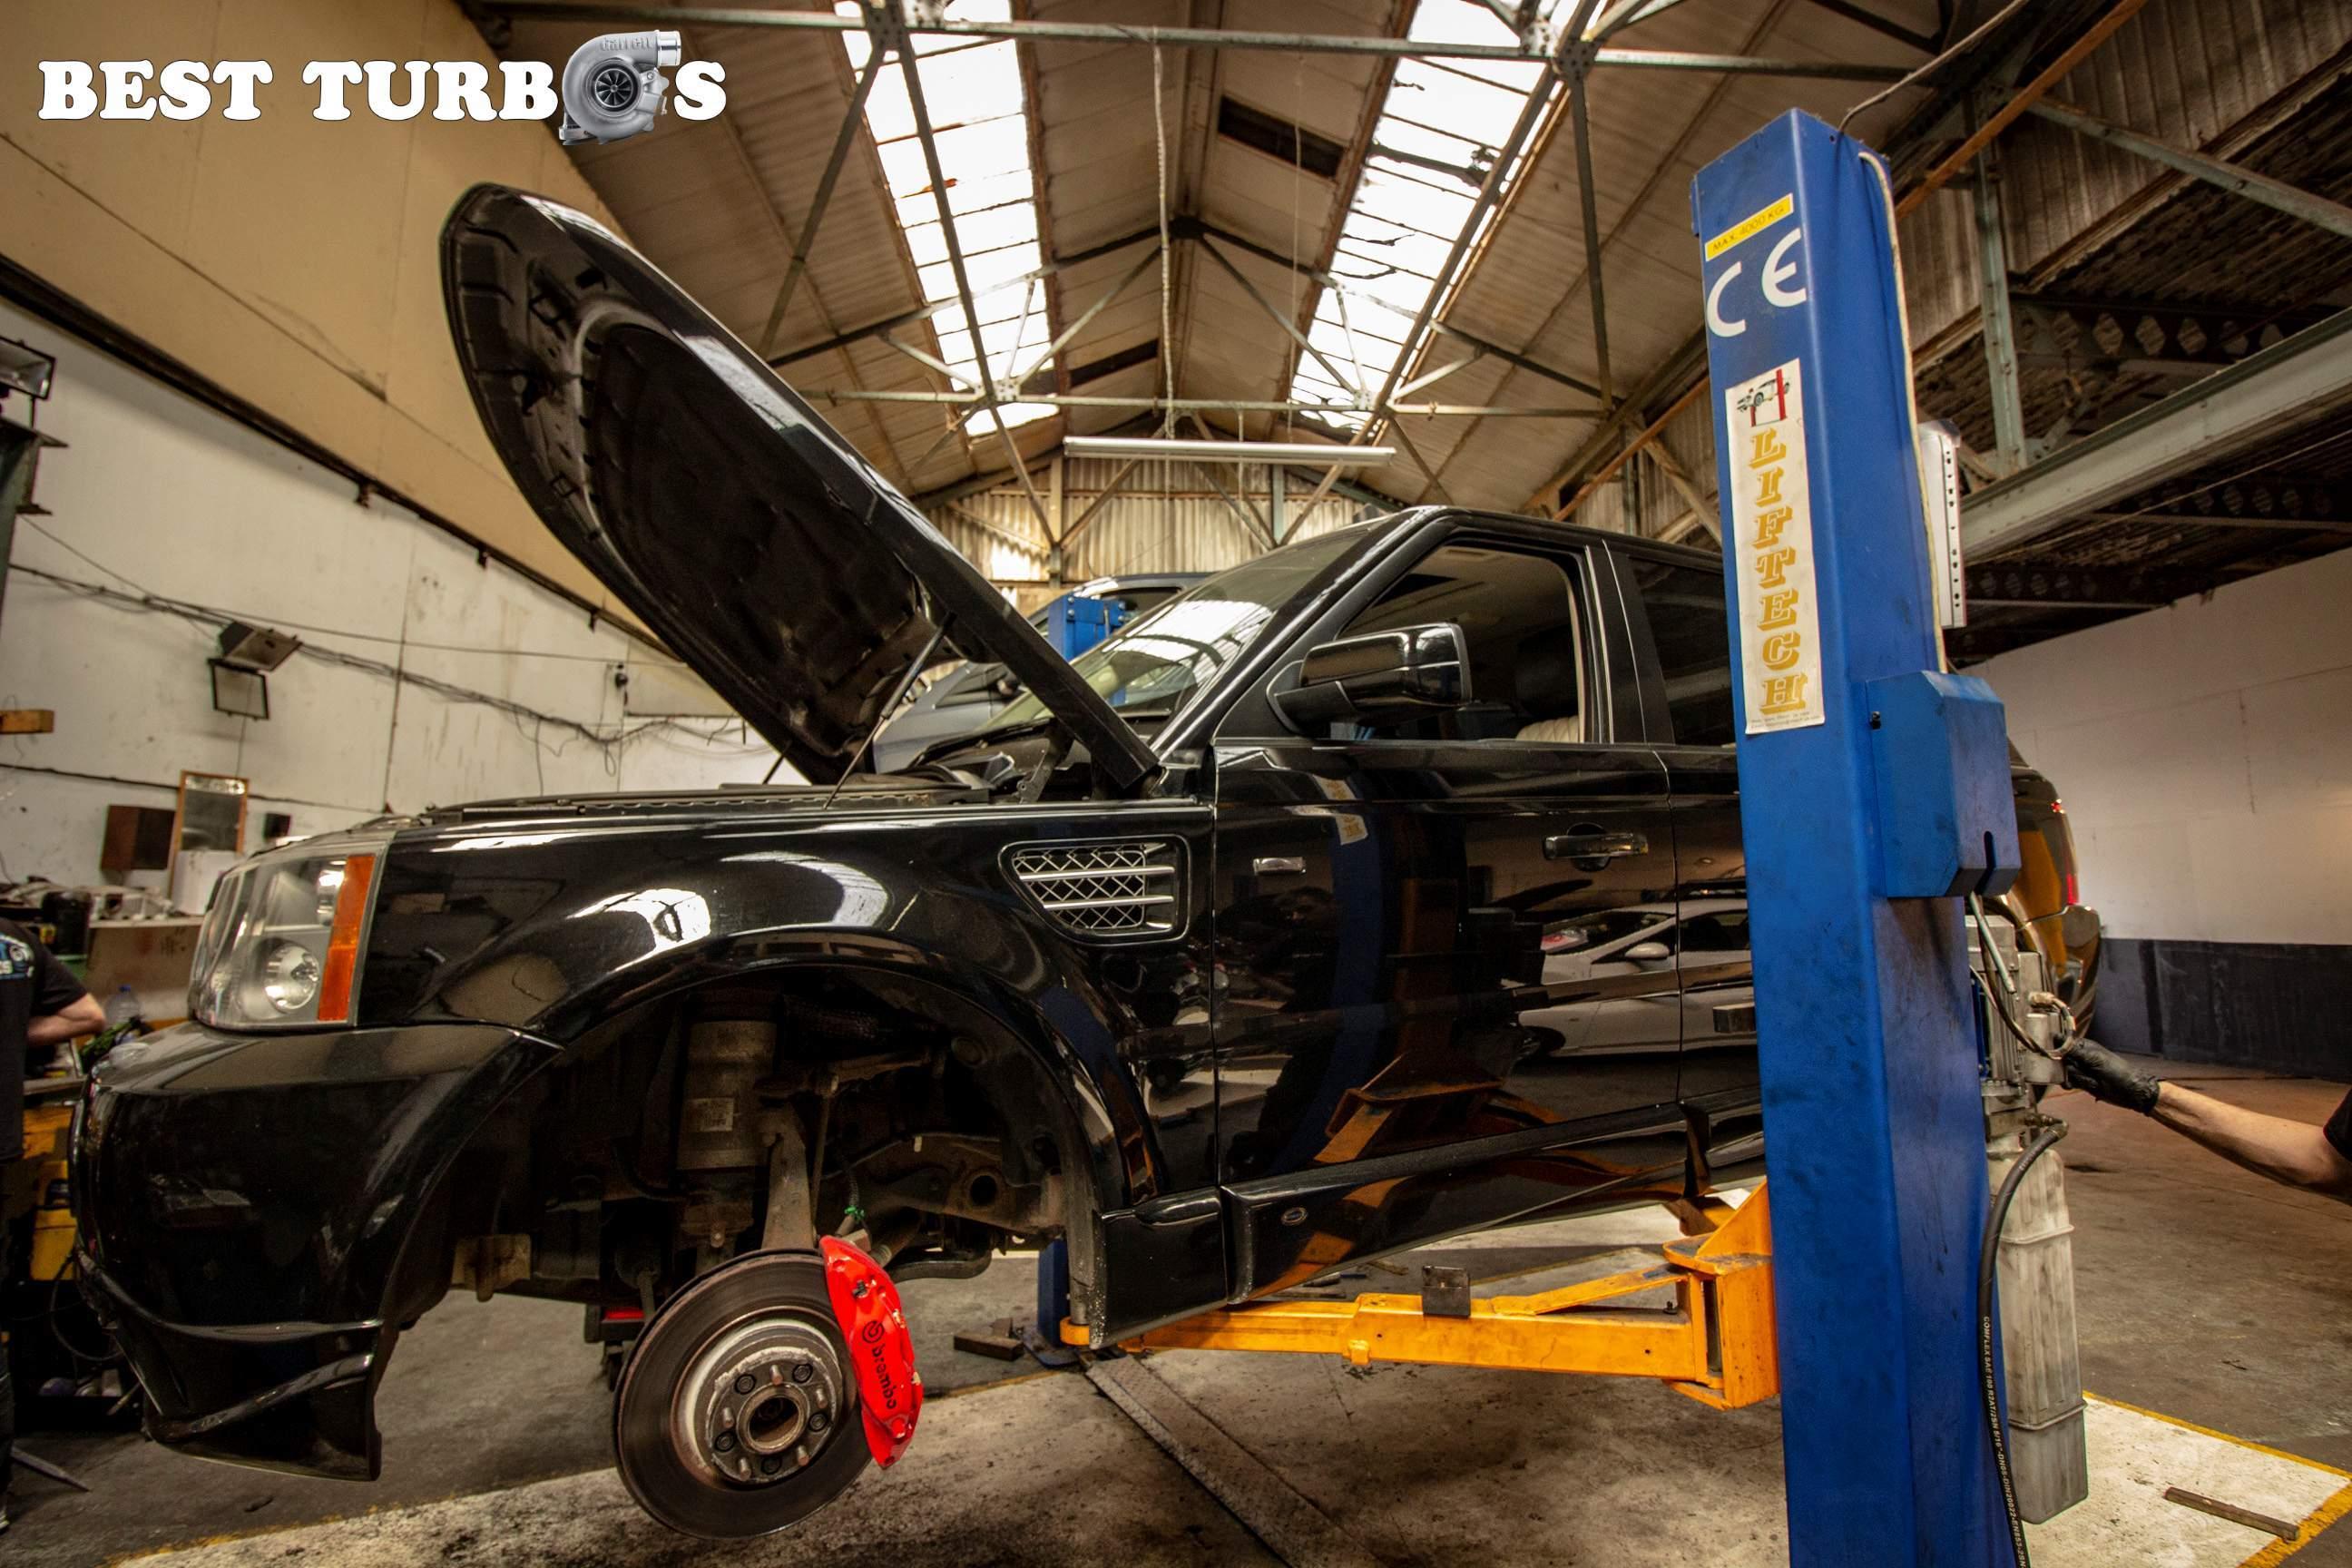 Range Rover Land Rover Sport Vogue Discovery 2 7 3 6 4 4 TDv6 TDv8